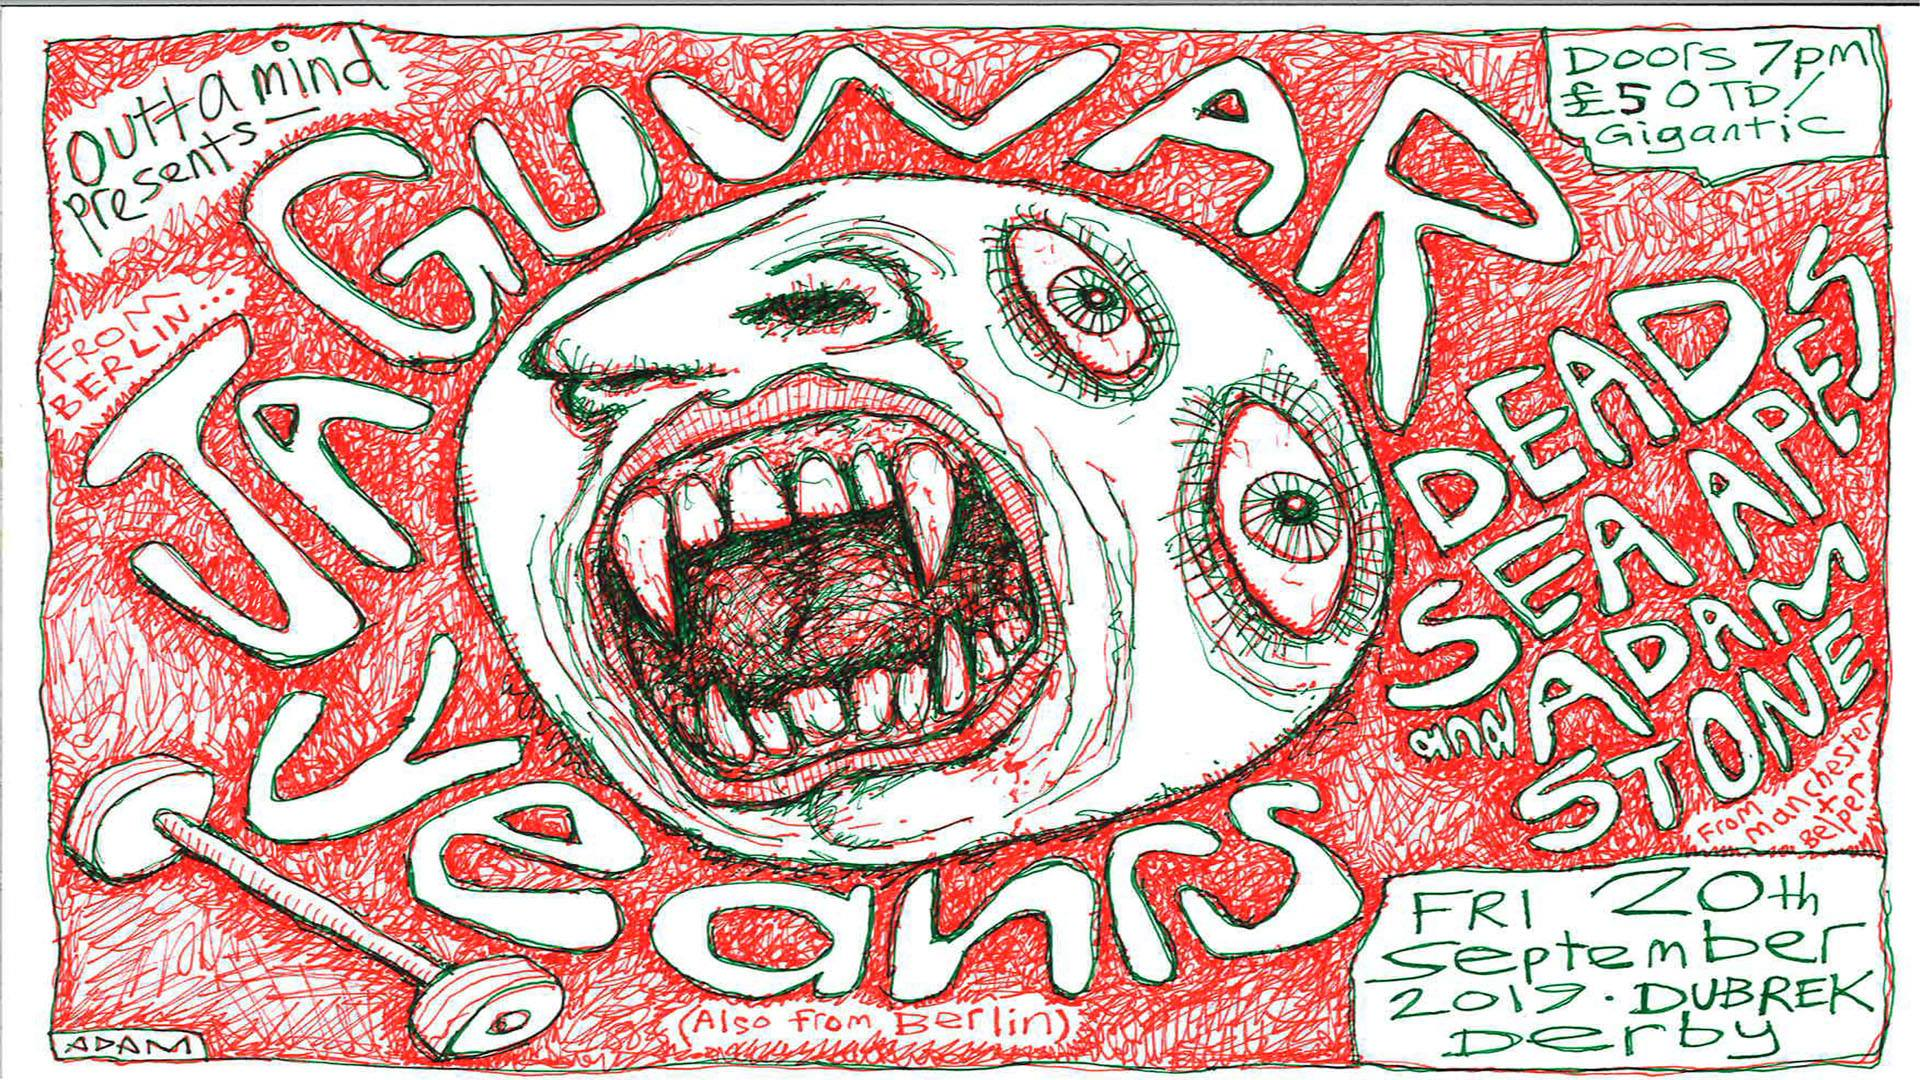 Jaguway + Yeahrs + Adam Stone & Dead Sea Apes - Fri 20th Sept at Dubrek Studios, Derby.